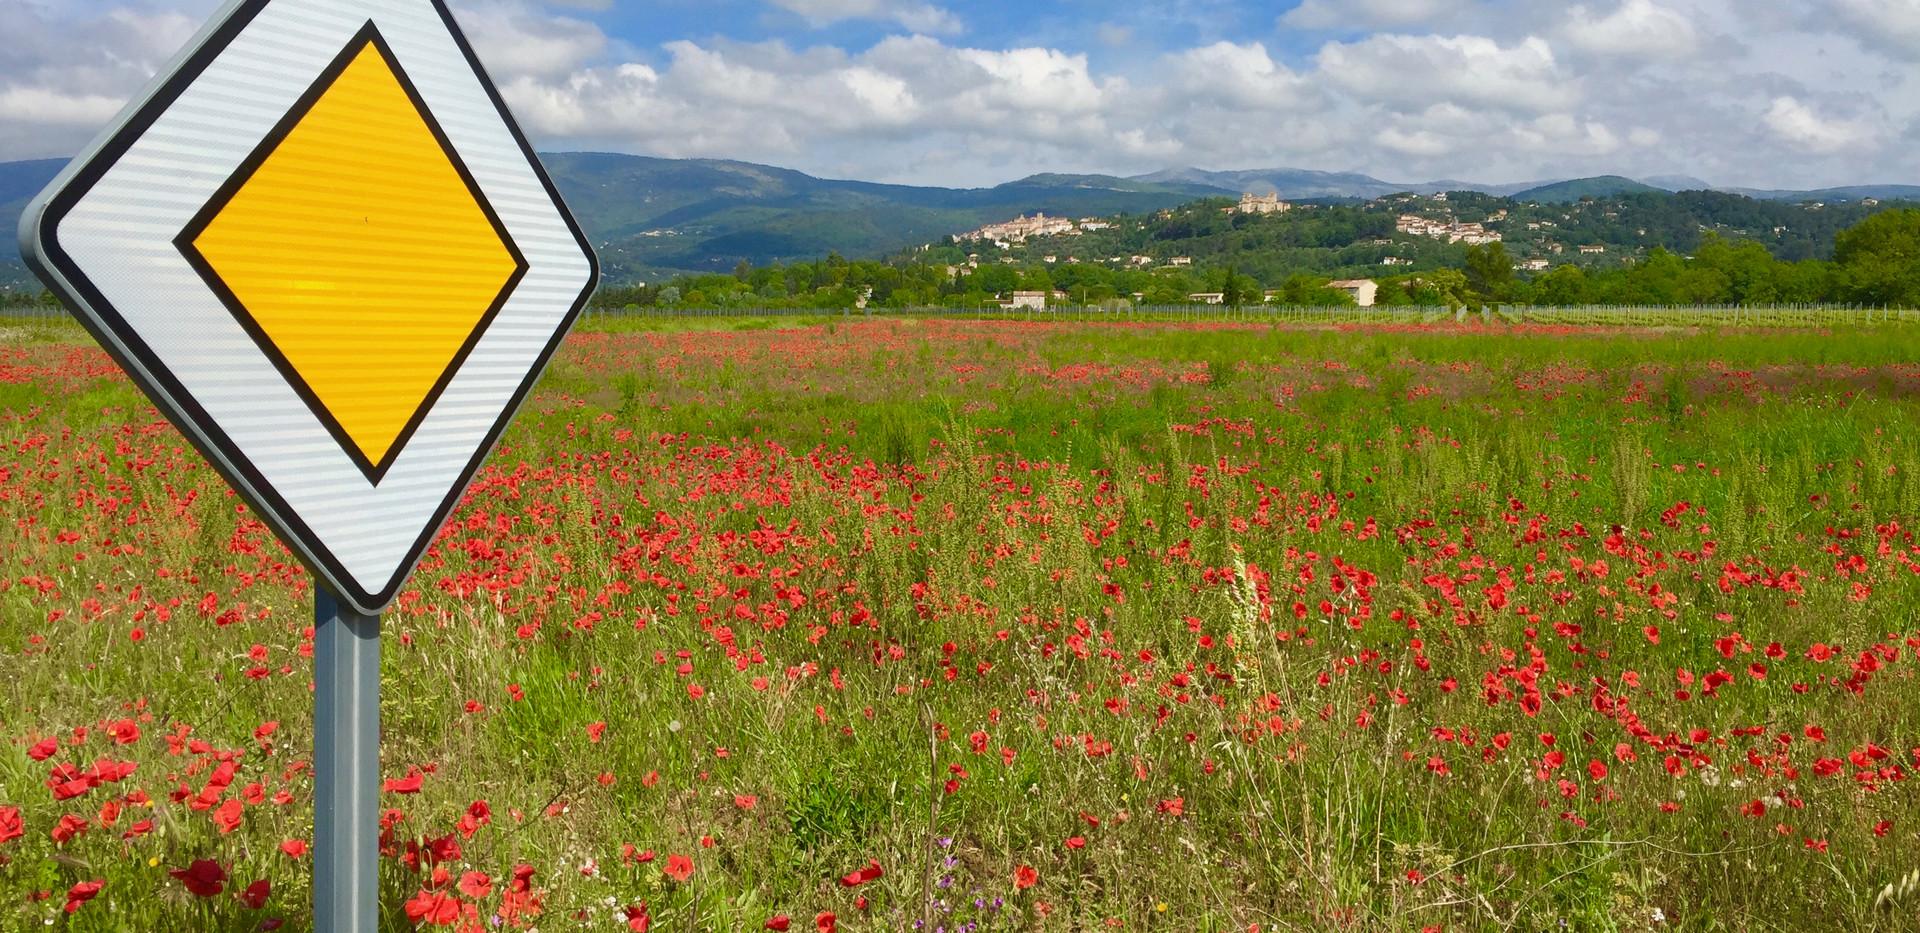 Poppies Ahead.